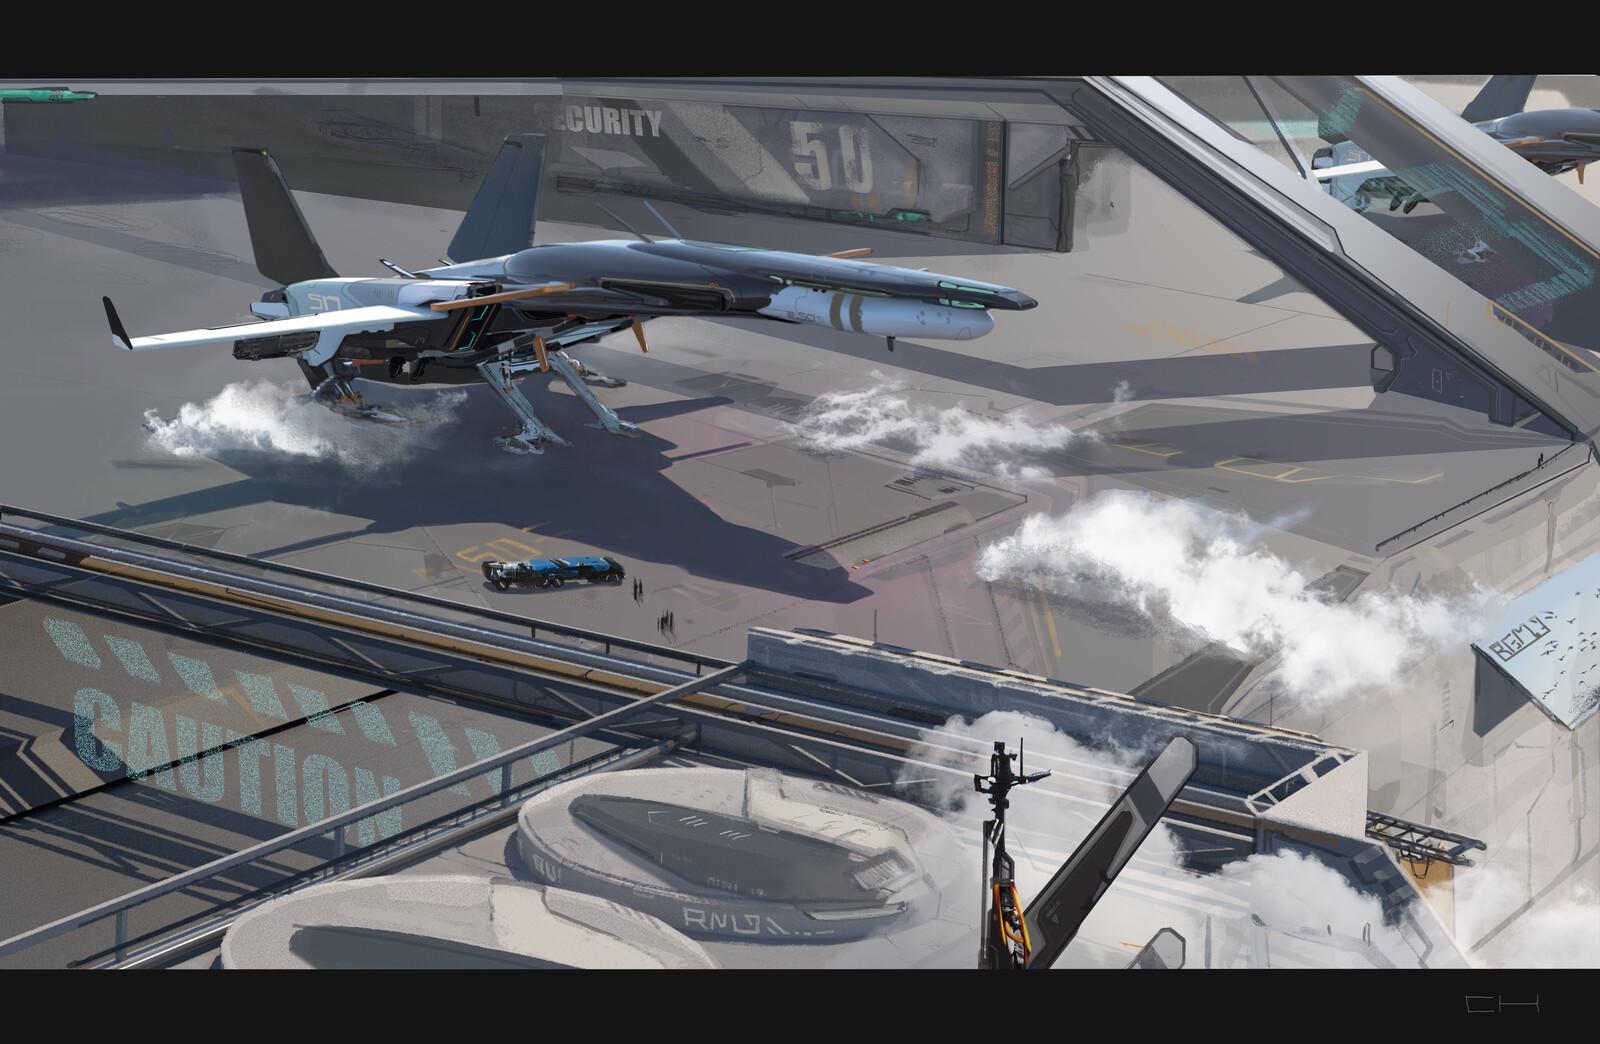 Security Rooftop